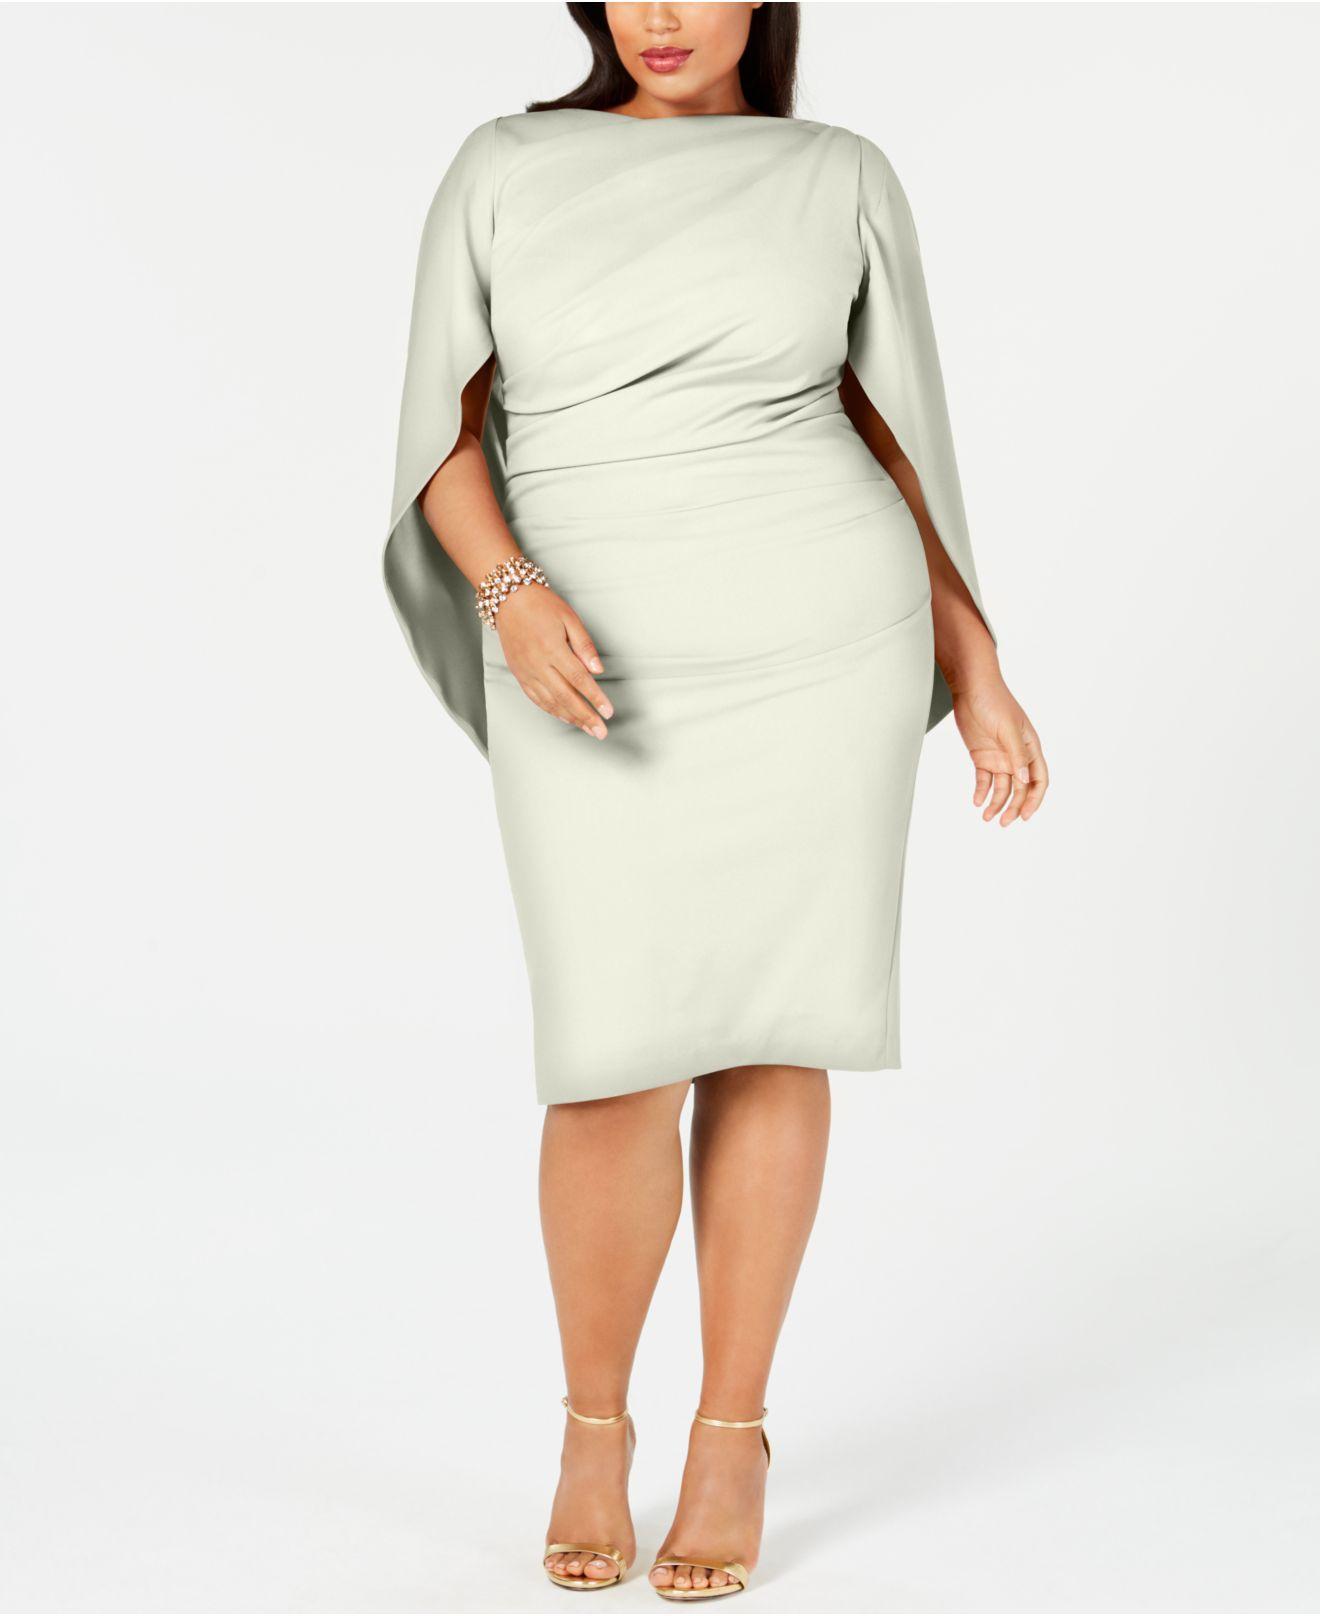 Women\'s White Plus Size Ruched Cape Dress